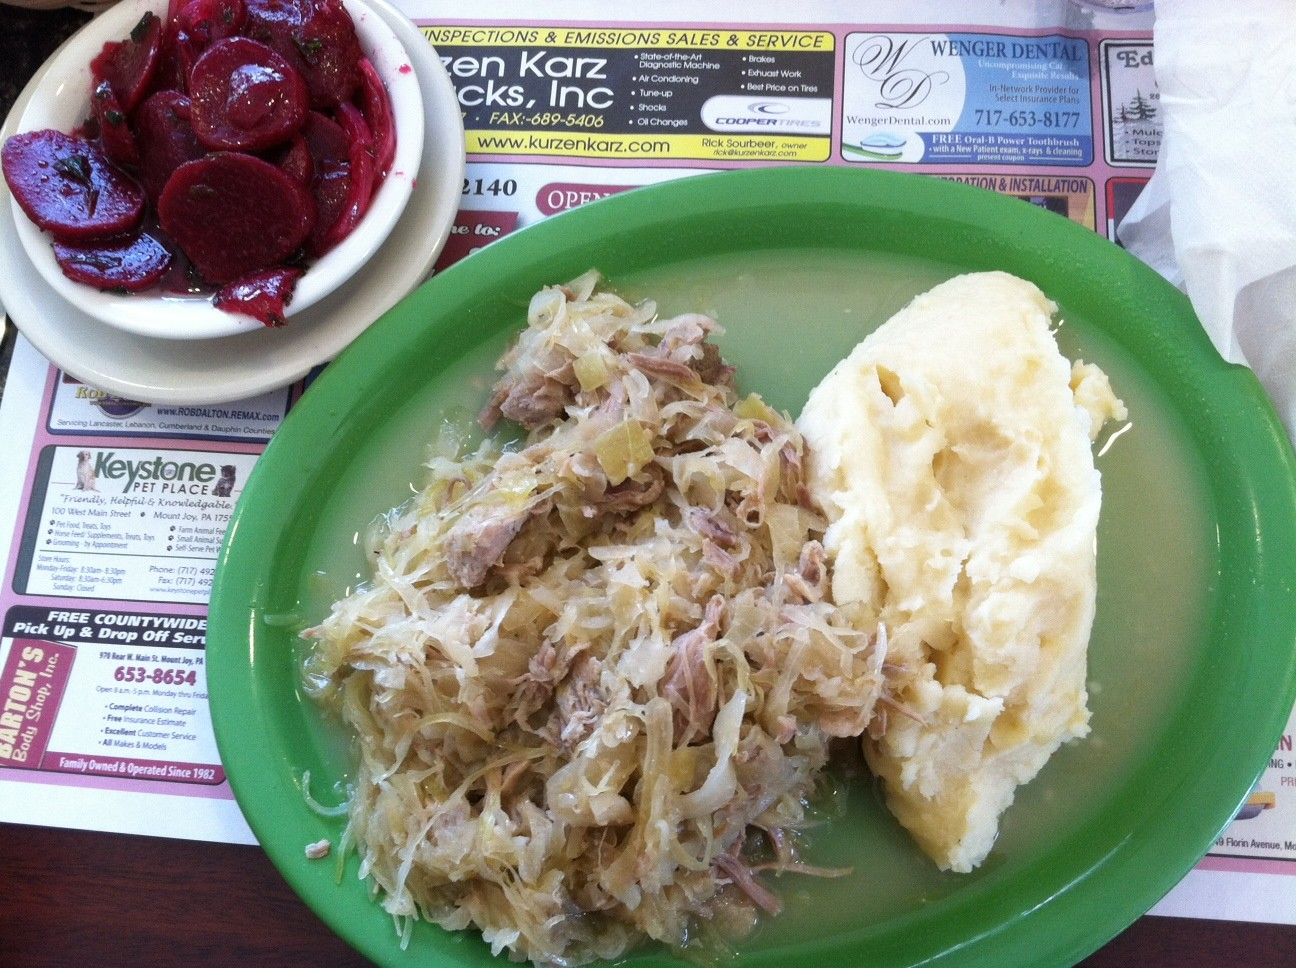 Pork sauerkraut recipes pennsylvania dutch